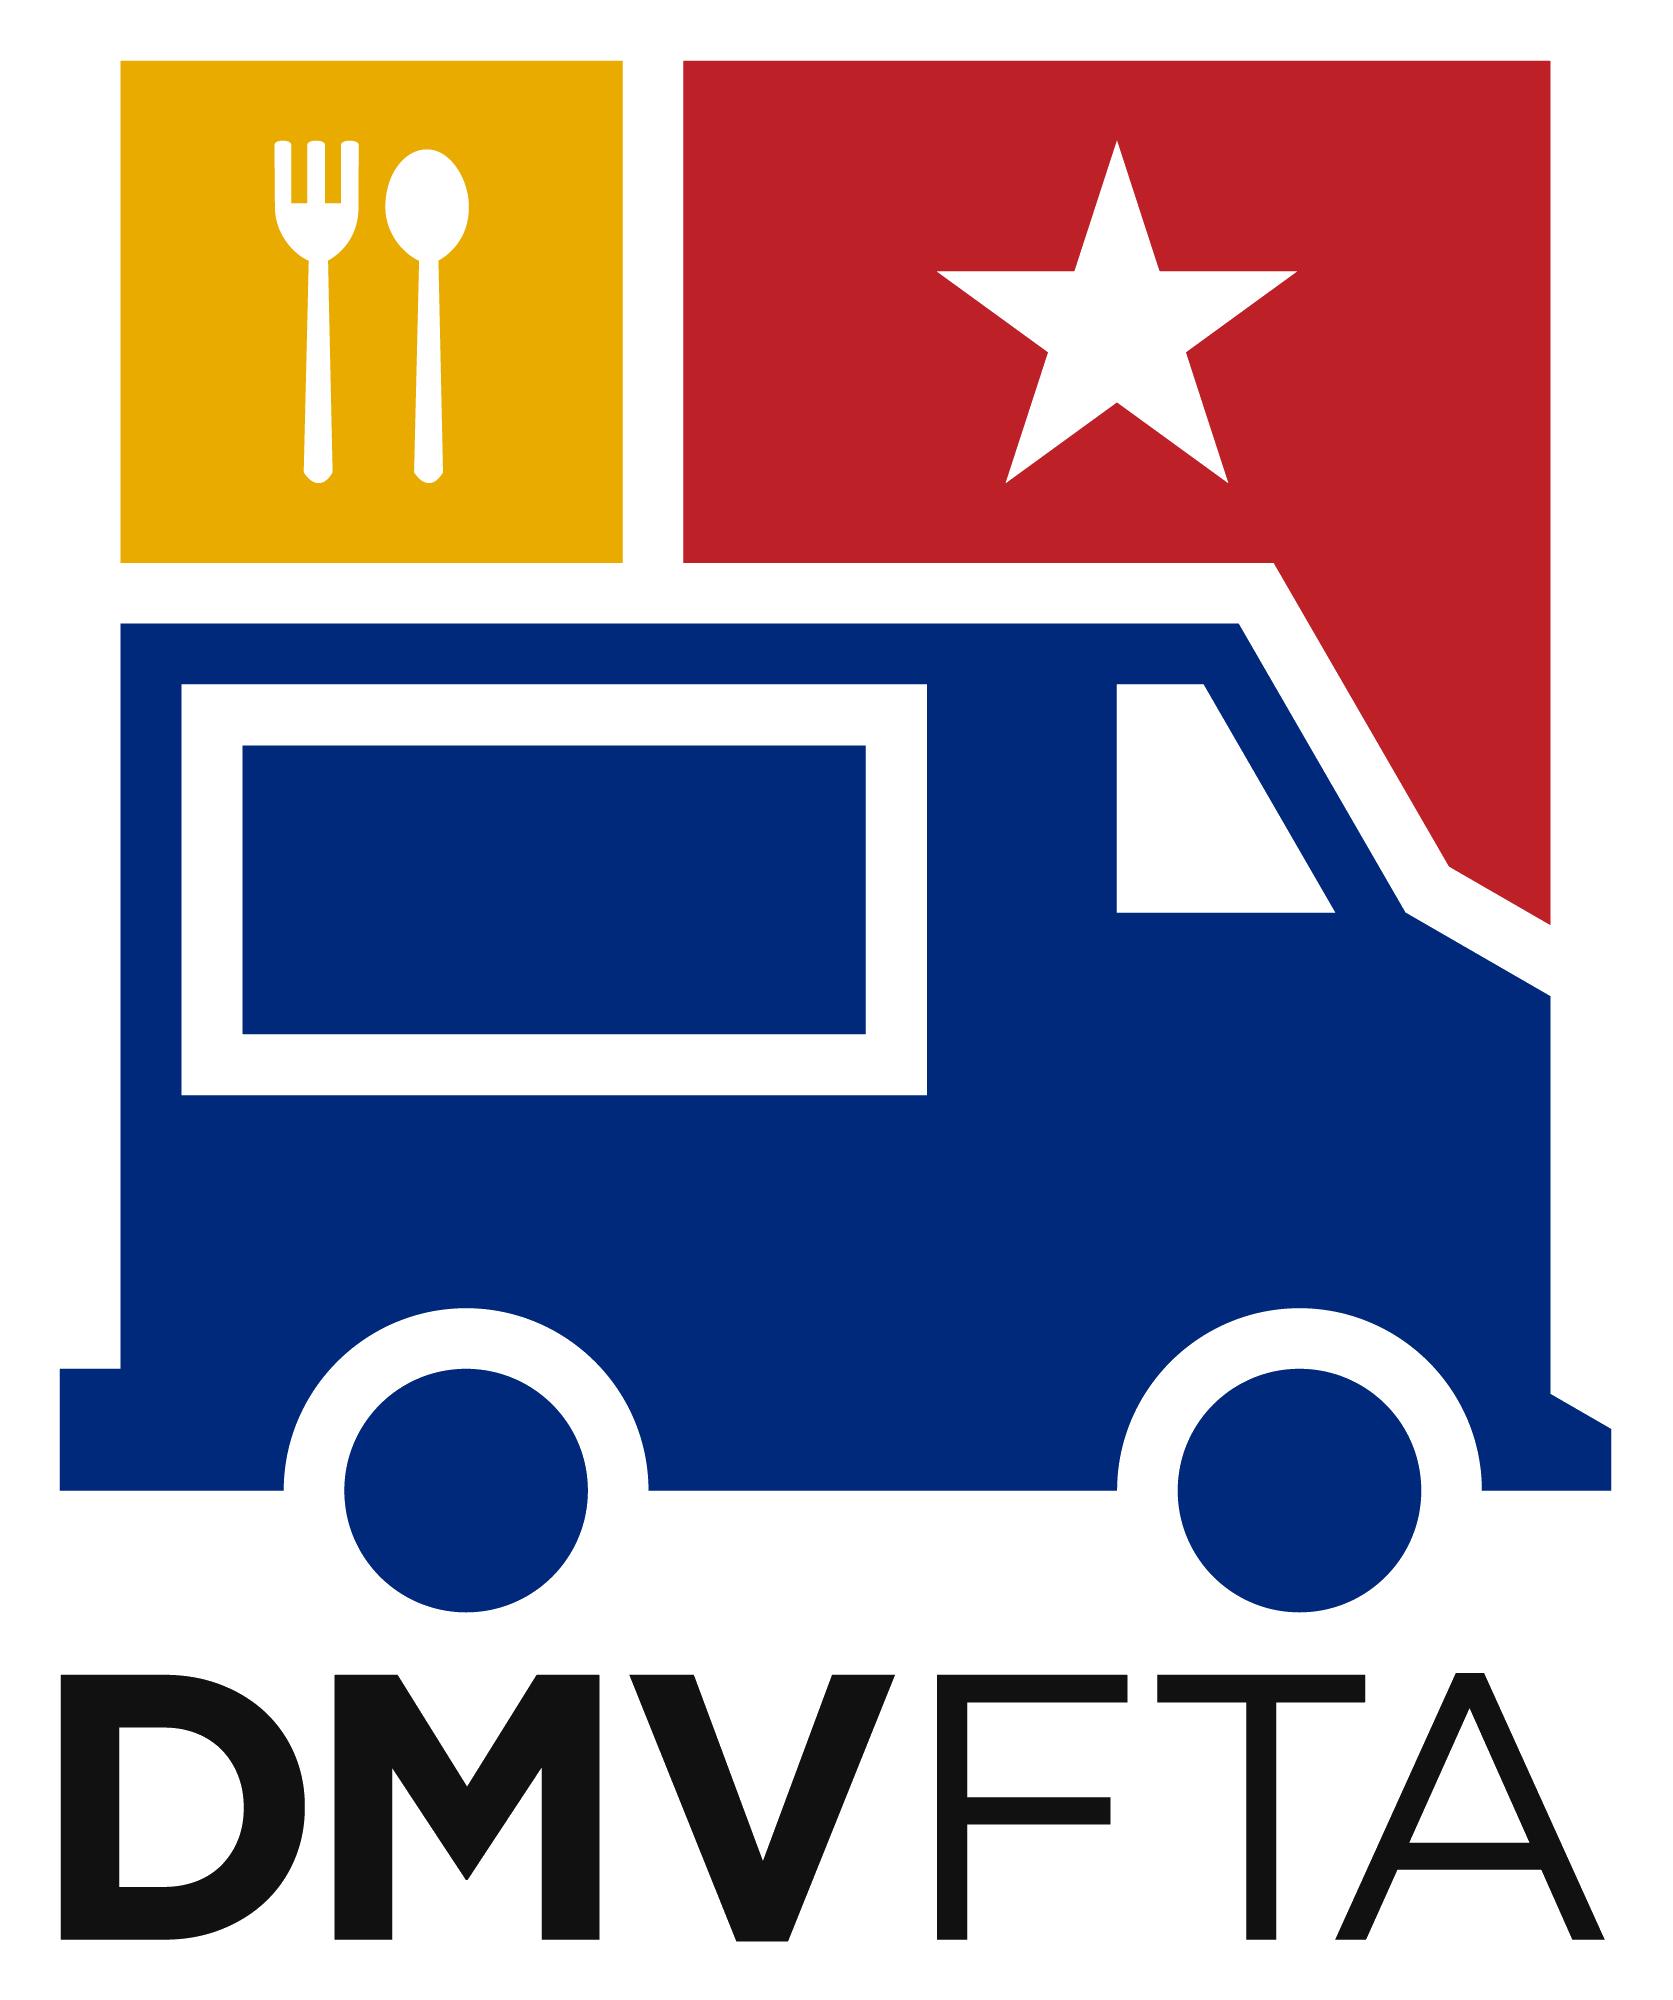 Drivers license clipart business license. Dmv food truck association